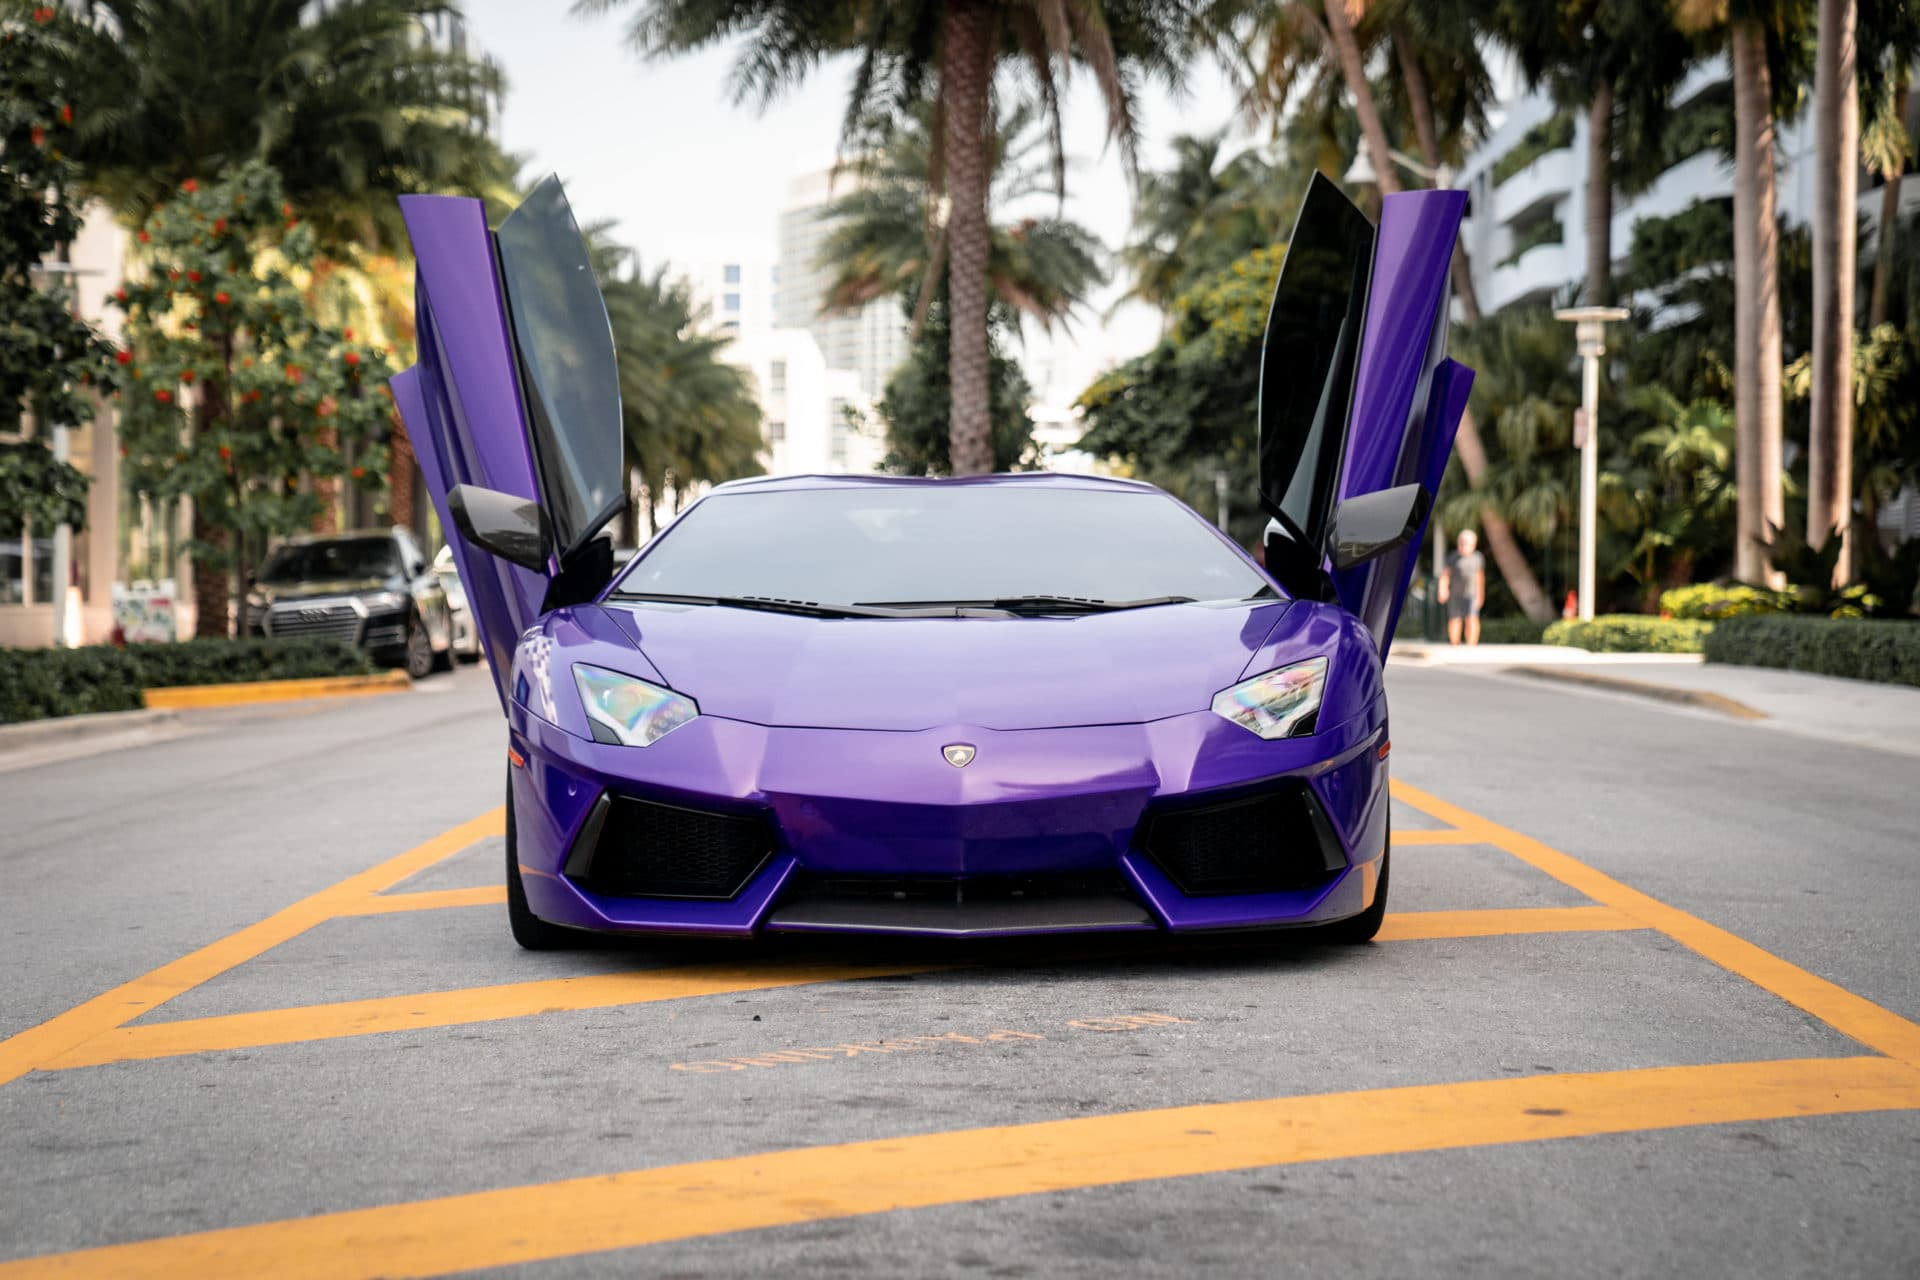 2016 Lamborghini Aventador Roadster Novitec   Miami, FL